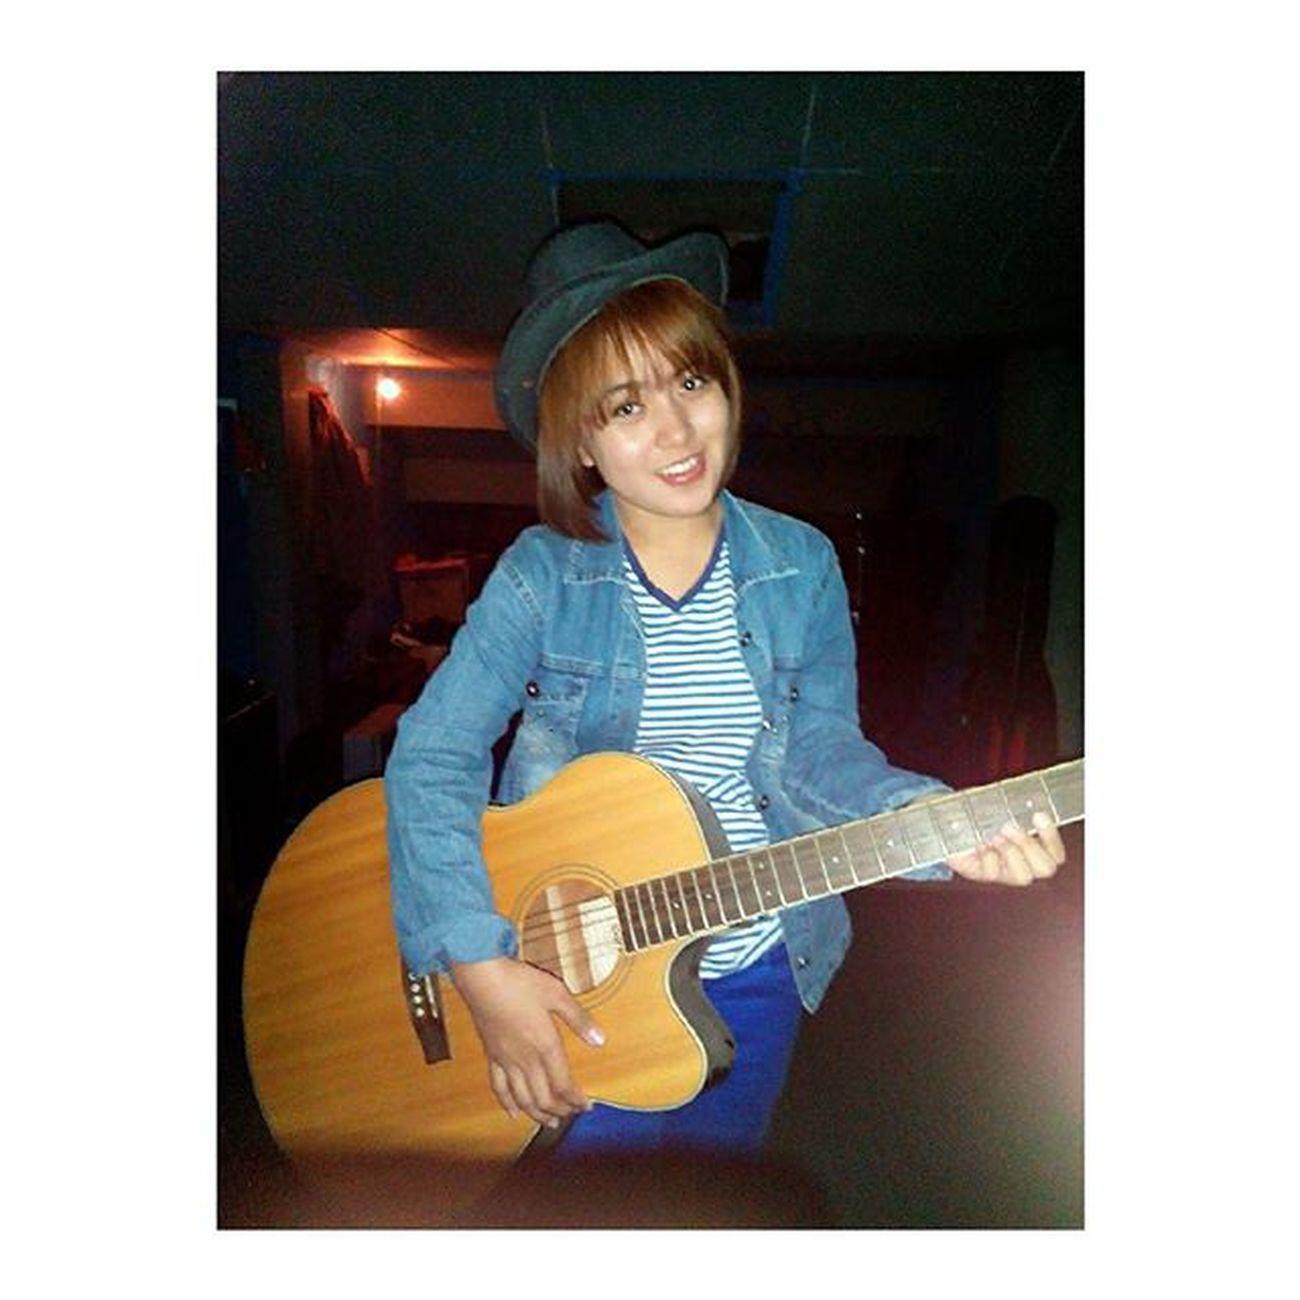 latepost 1yearsago gendong gitar tok terus di jepret by : @christian_a.p